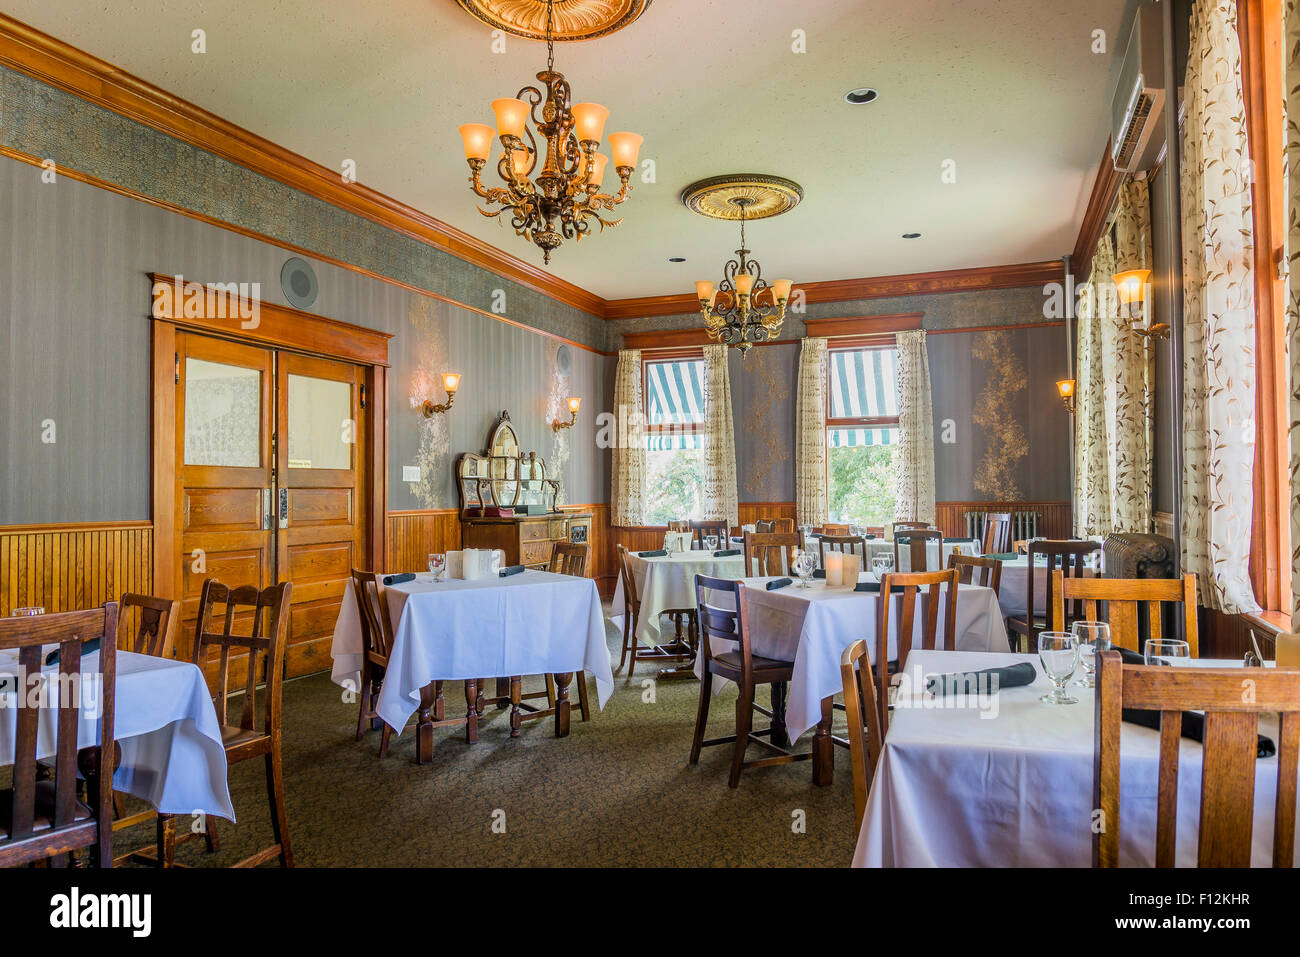 Dining room, Historic Quilchena Hotel, Quilchena, near Merritt, British Columbia, Canada - Stock Image